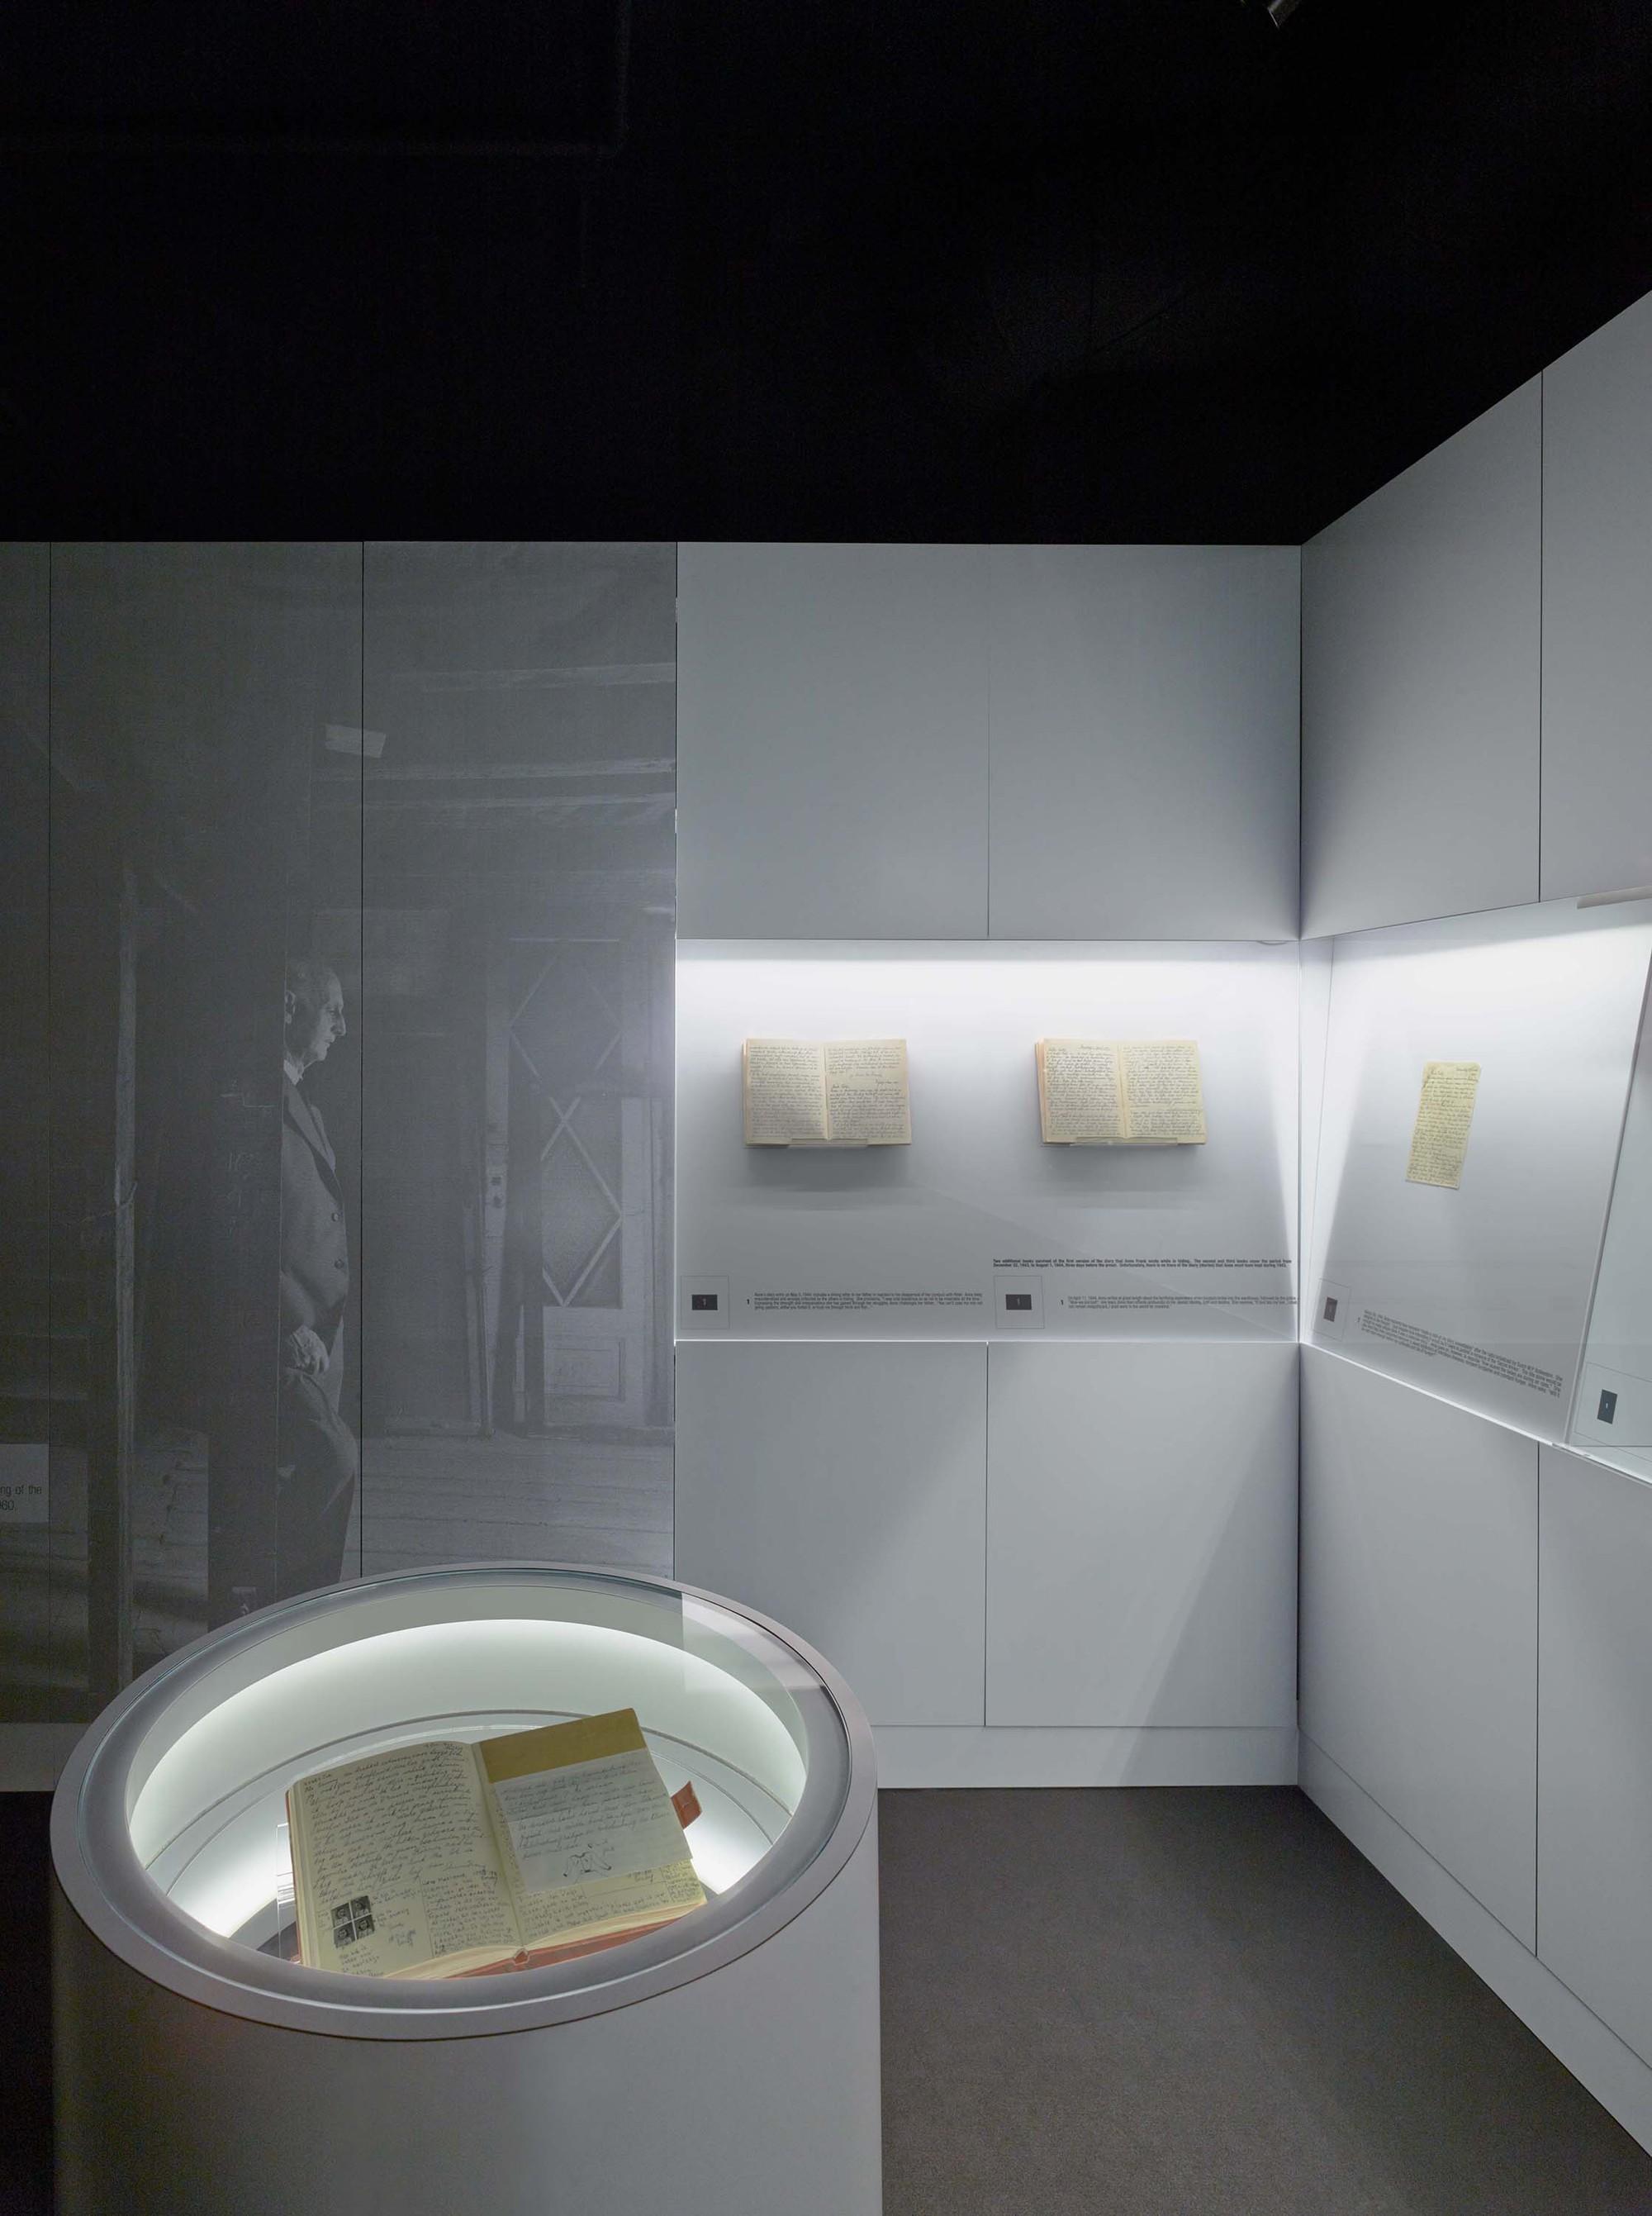 gallery of museum of tolerance anne frank exhibit yazdani zoom image view original size